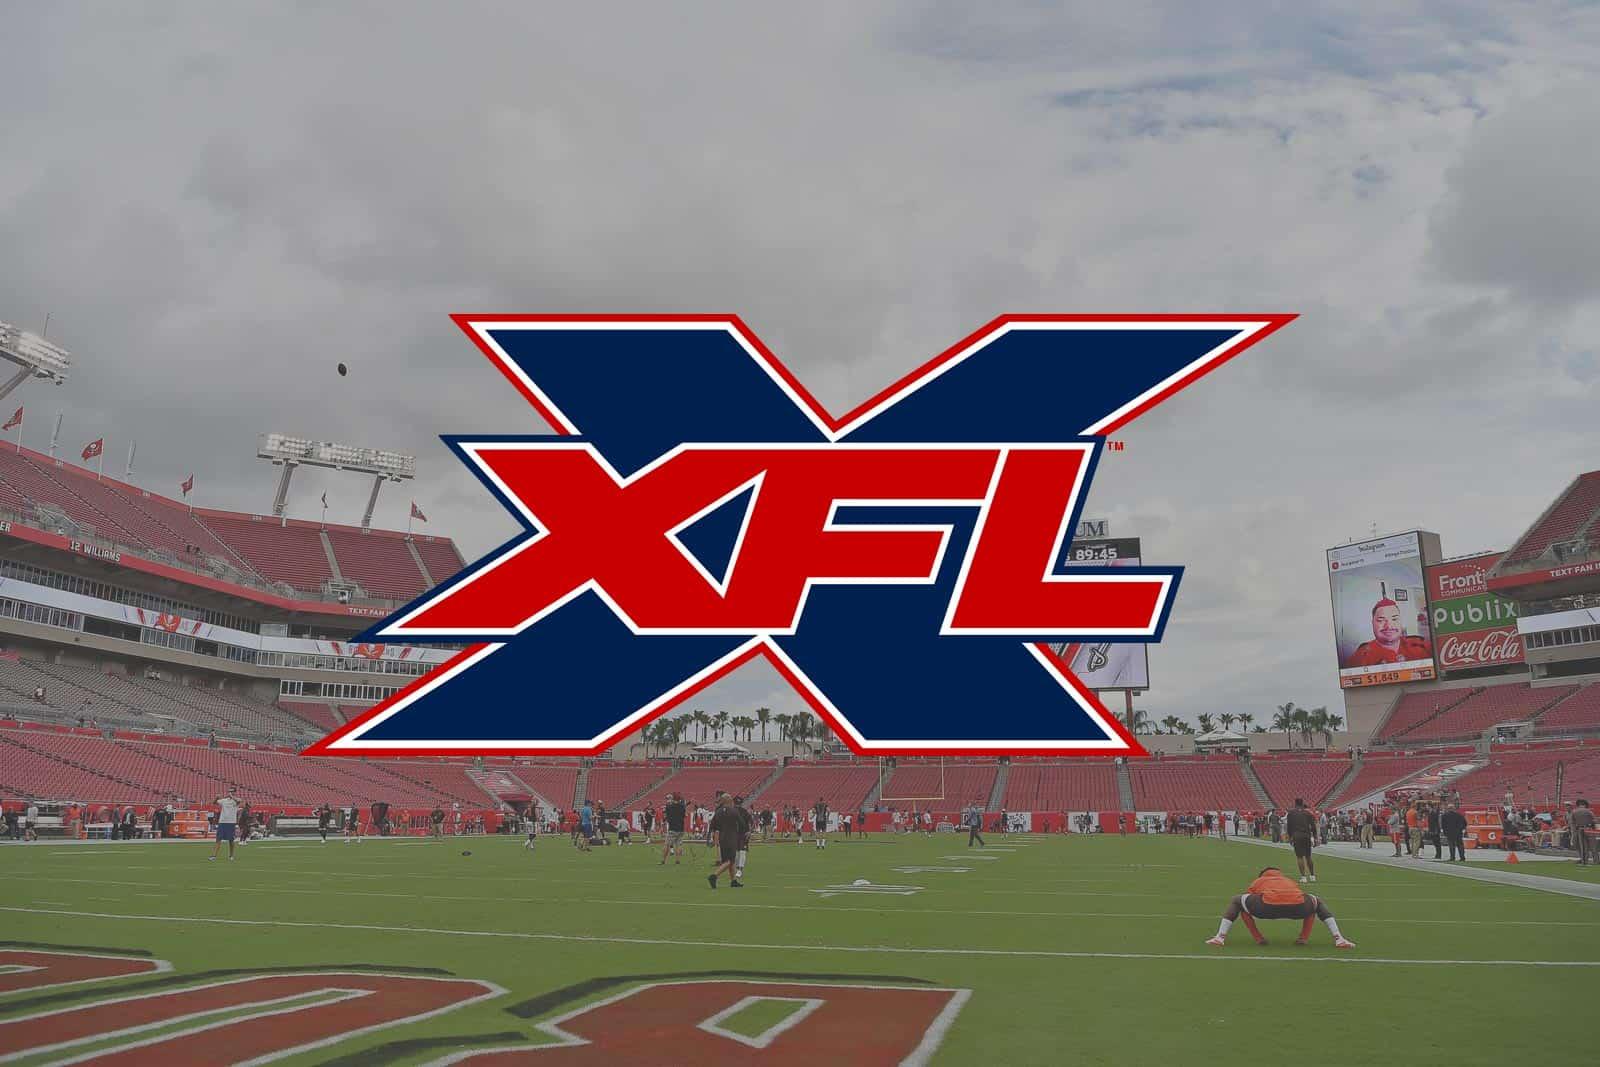 XFL Team Names, Logos